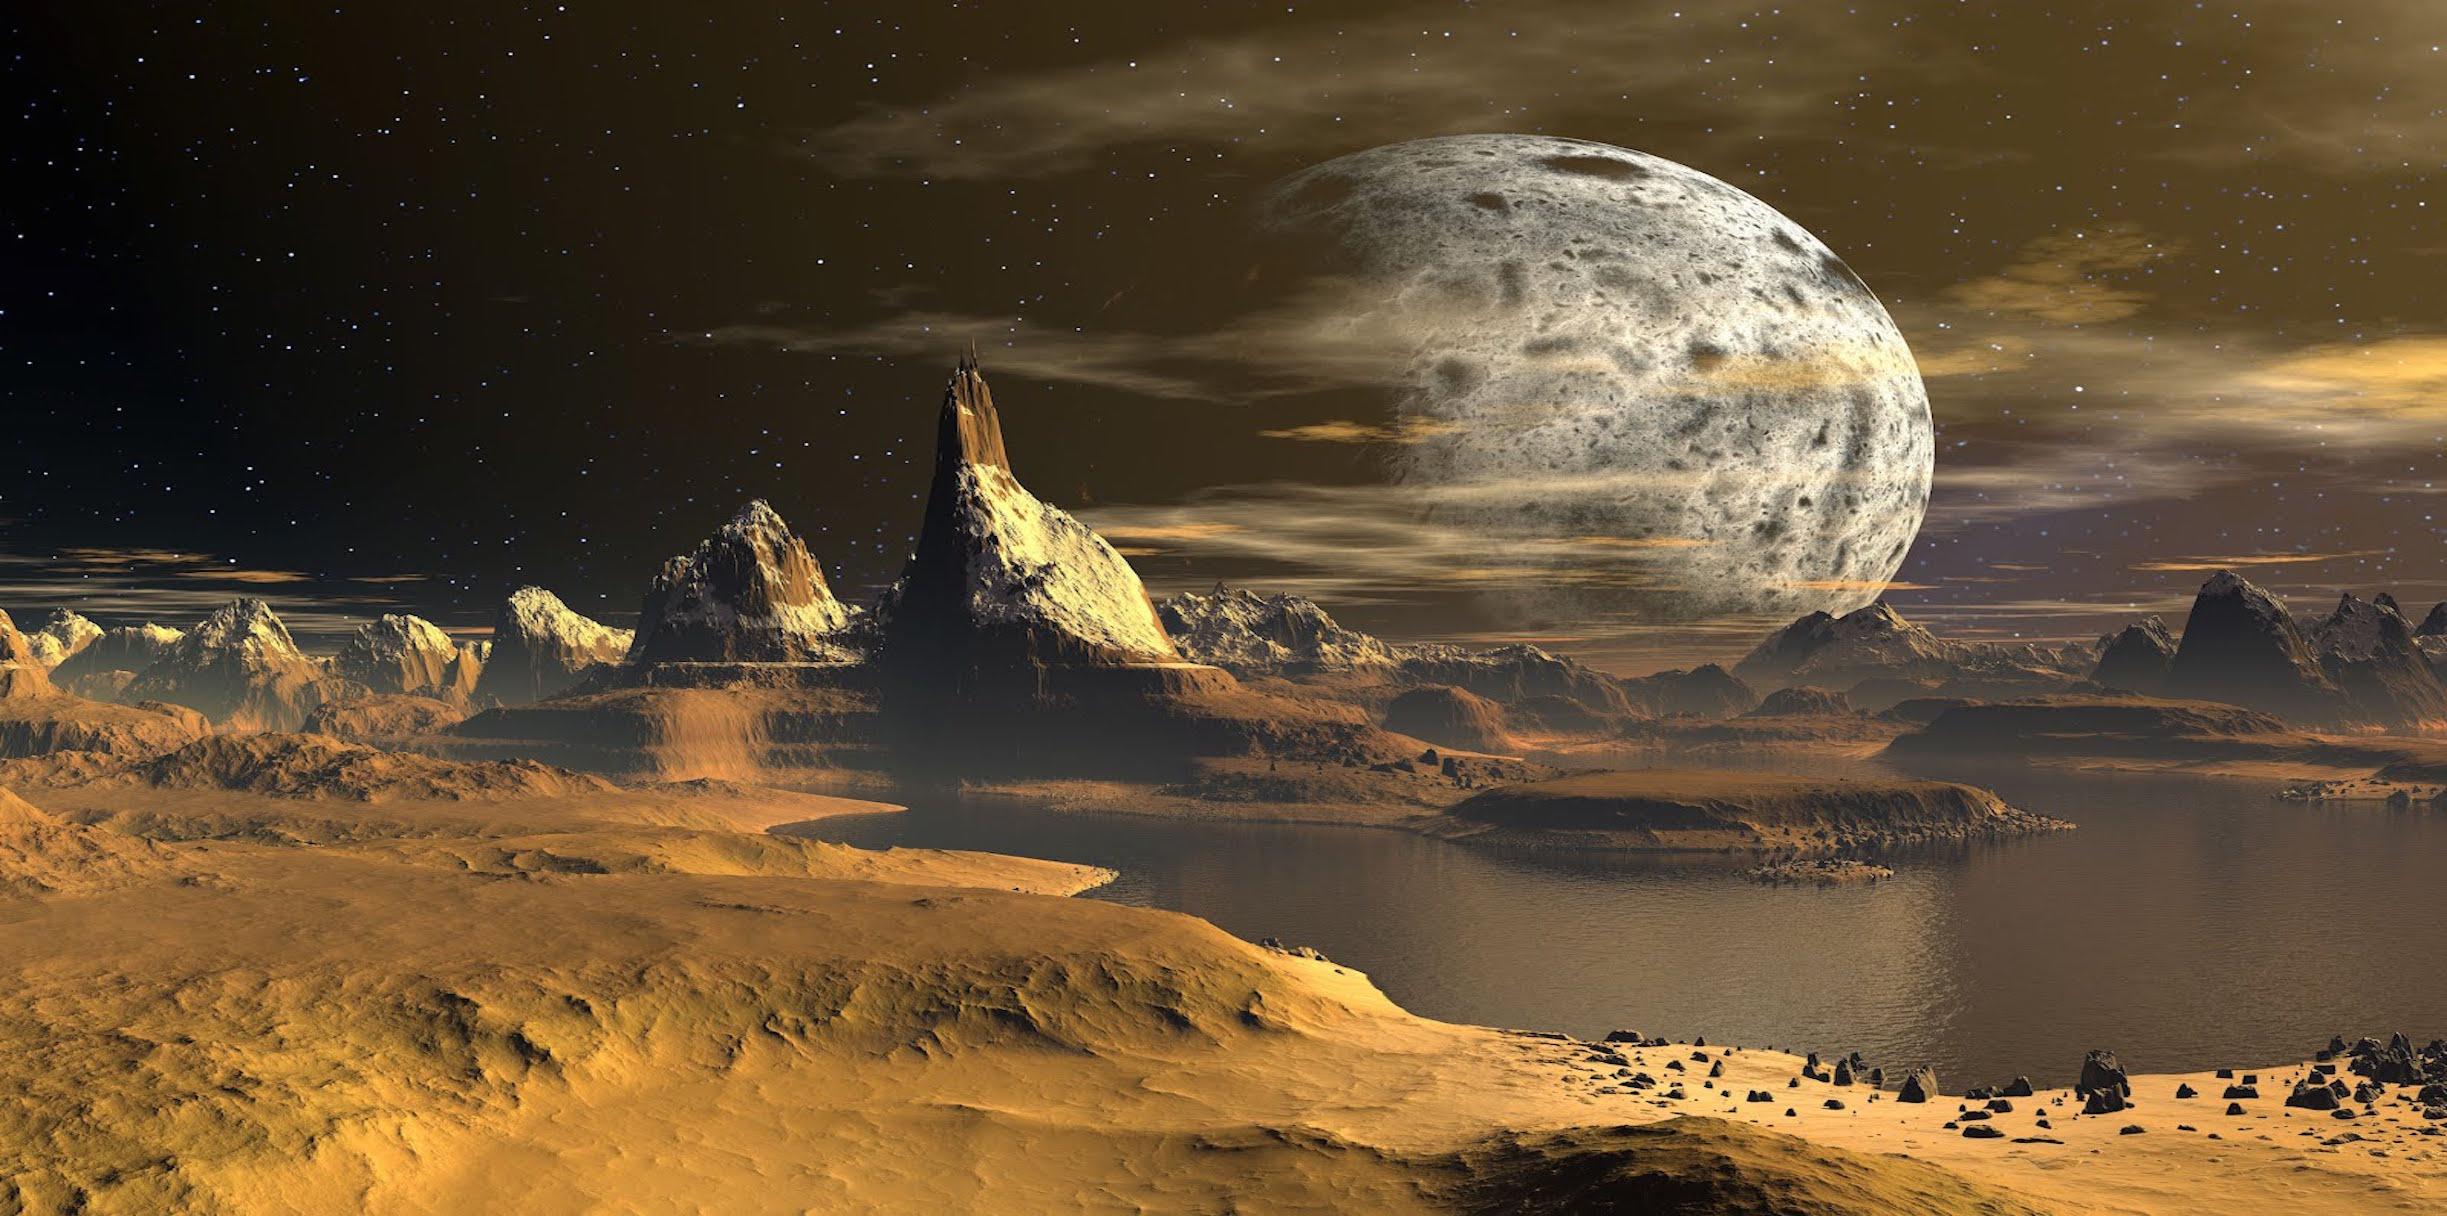 Resultado de imagen para planeta titán